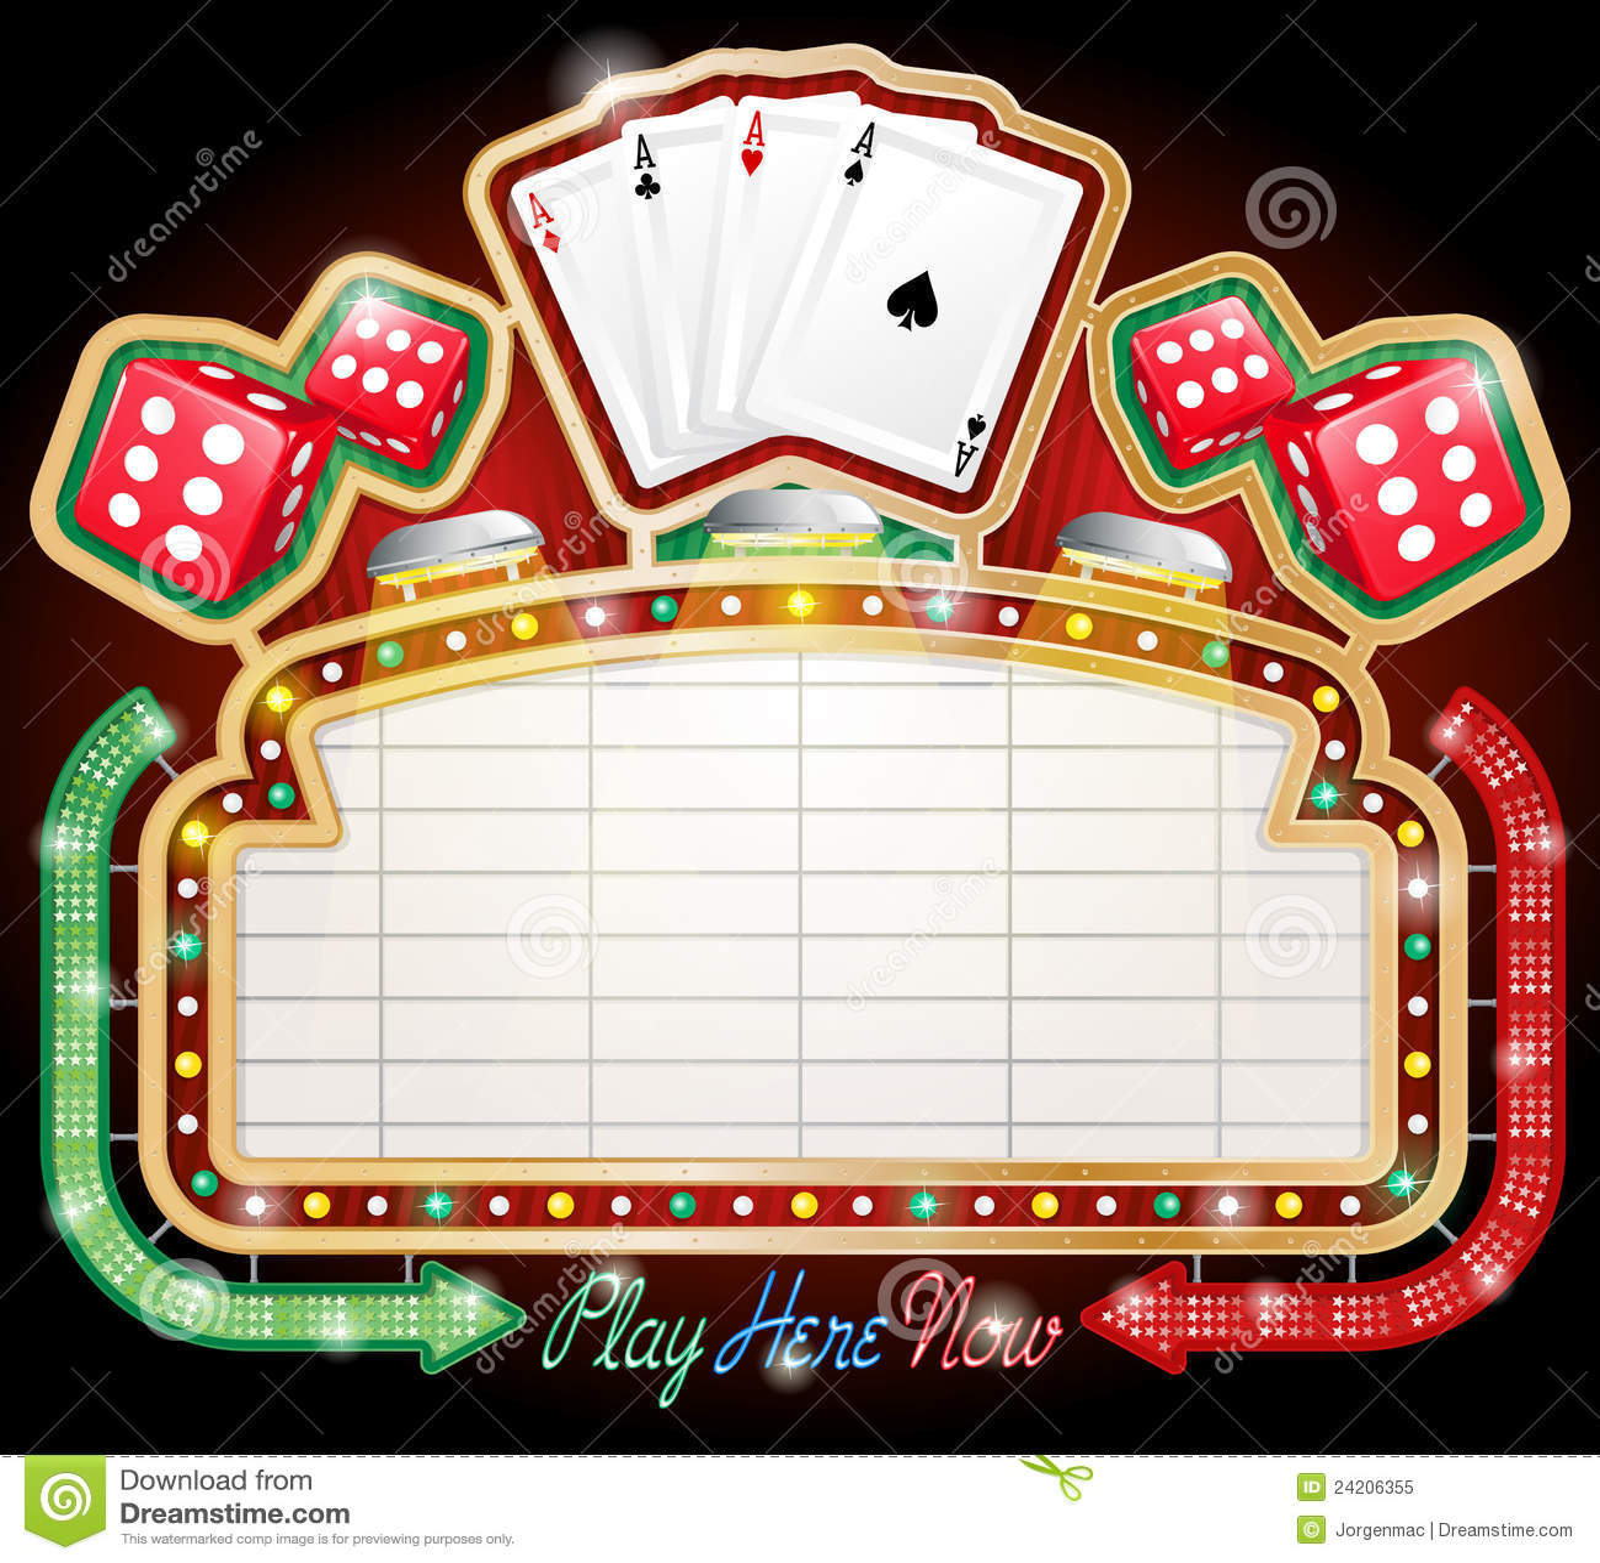 Casino Sign Royalty Free Stock Photo Image 24206355